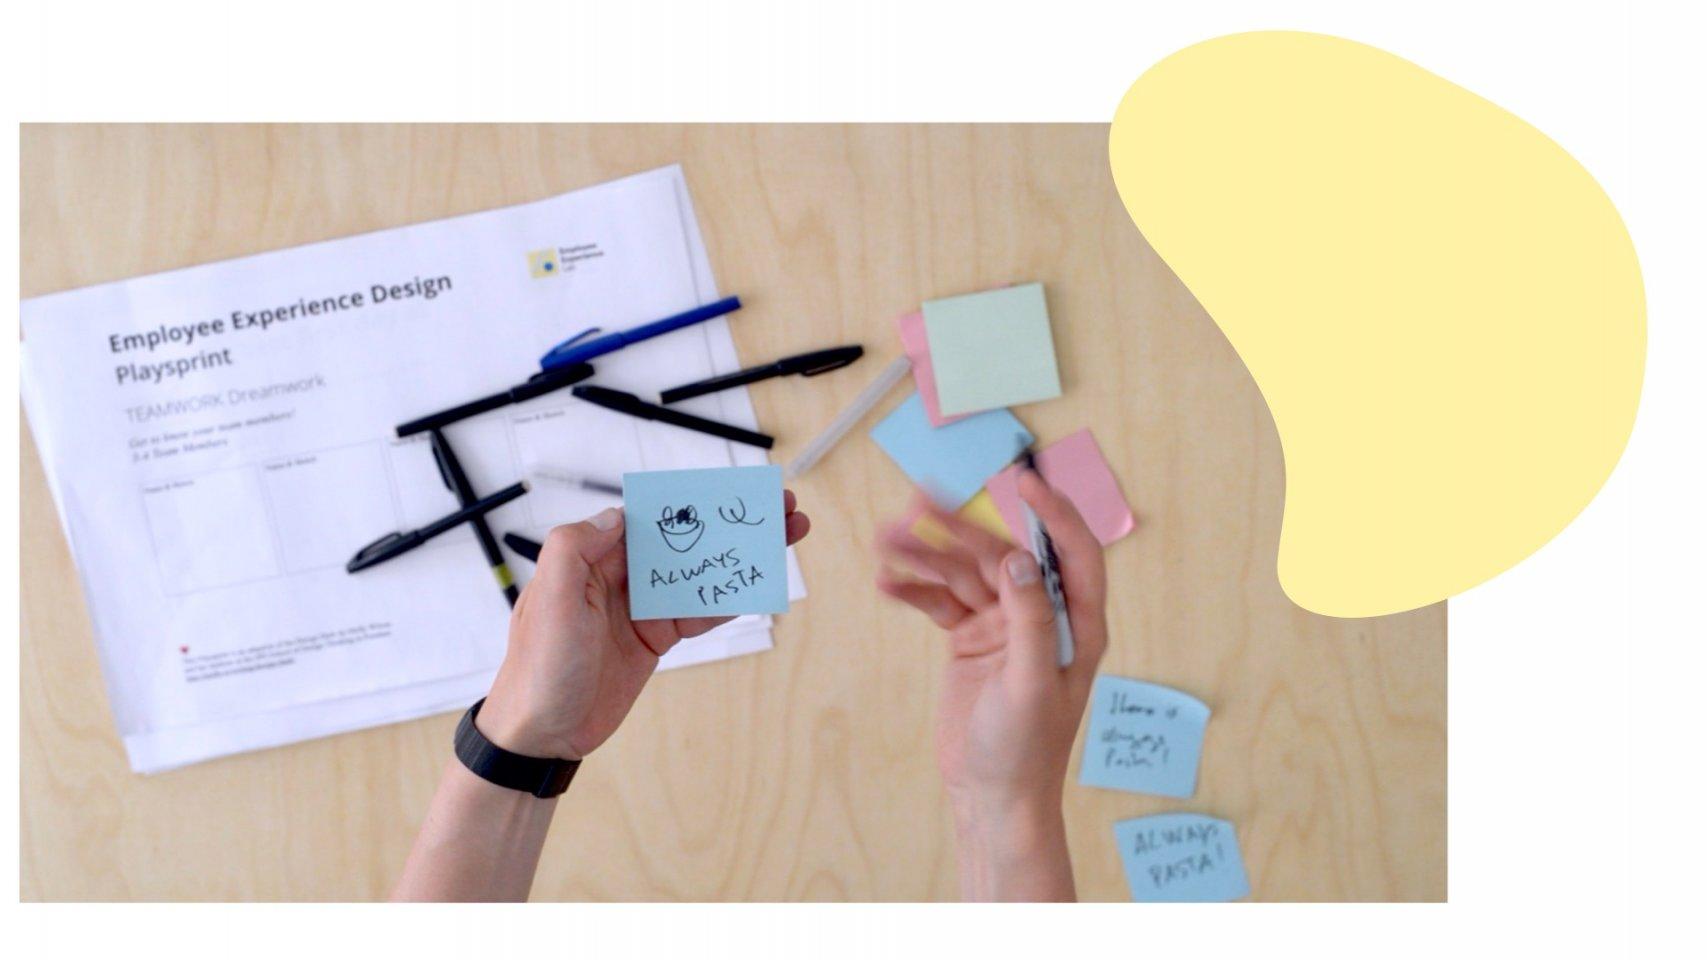 Design Thinking for HR Playsprint